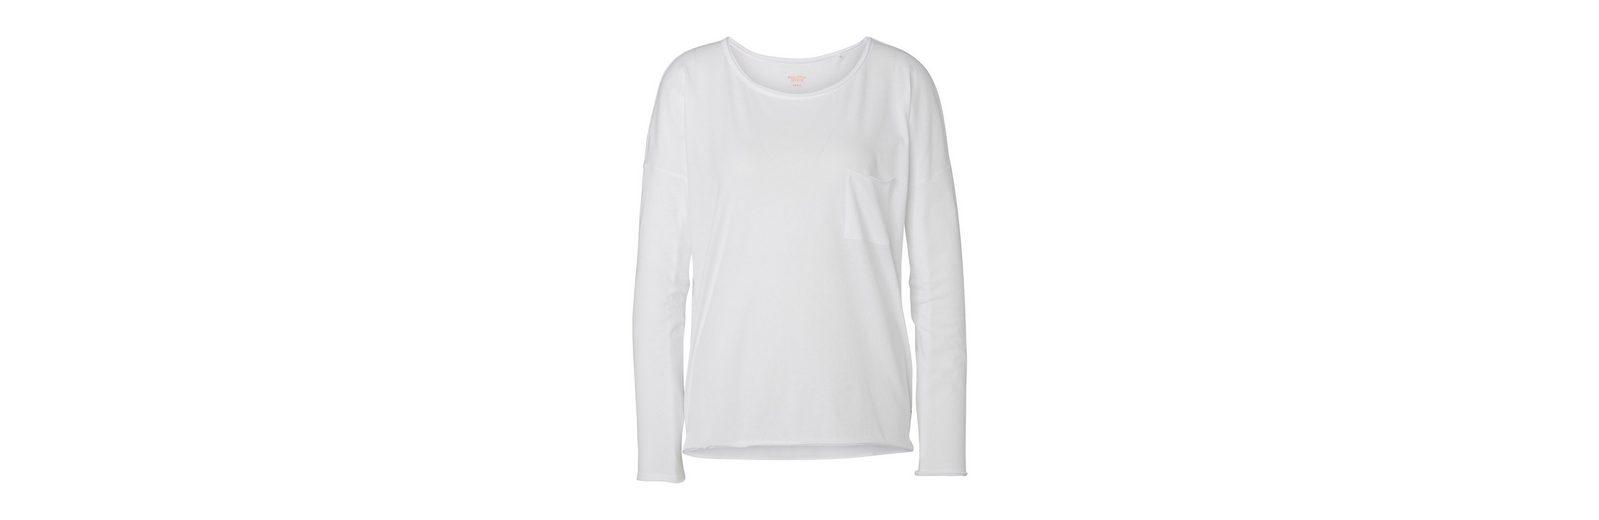 Marc O'Polo DENIM Langarmshirt Mit Paypal Verkauf Online YU8rcZ7B2